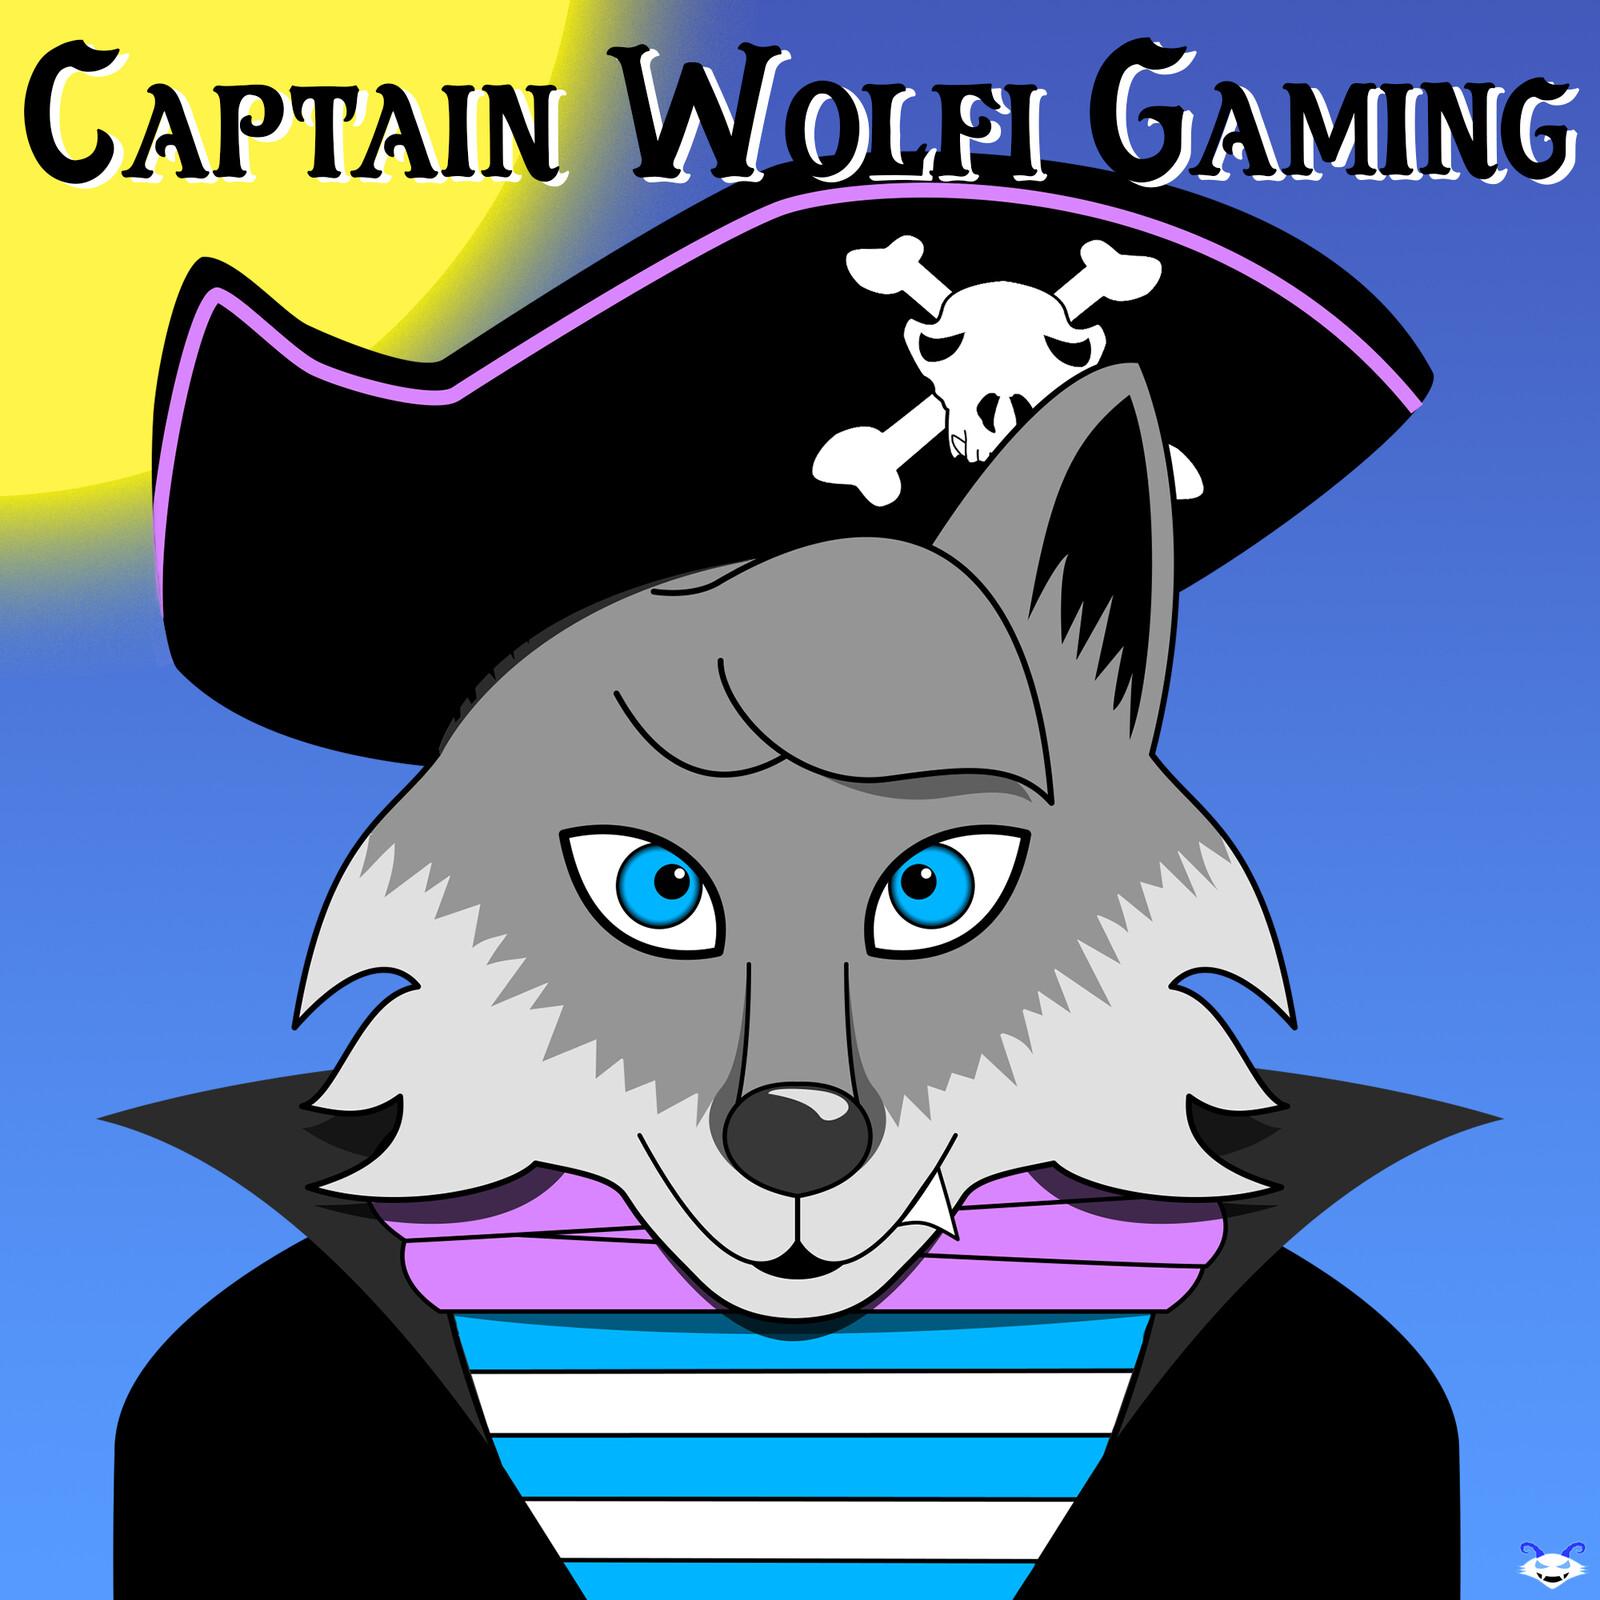 CaptainWolfiGaming Fan Art #1